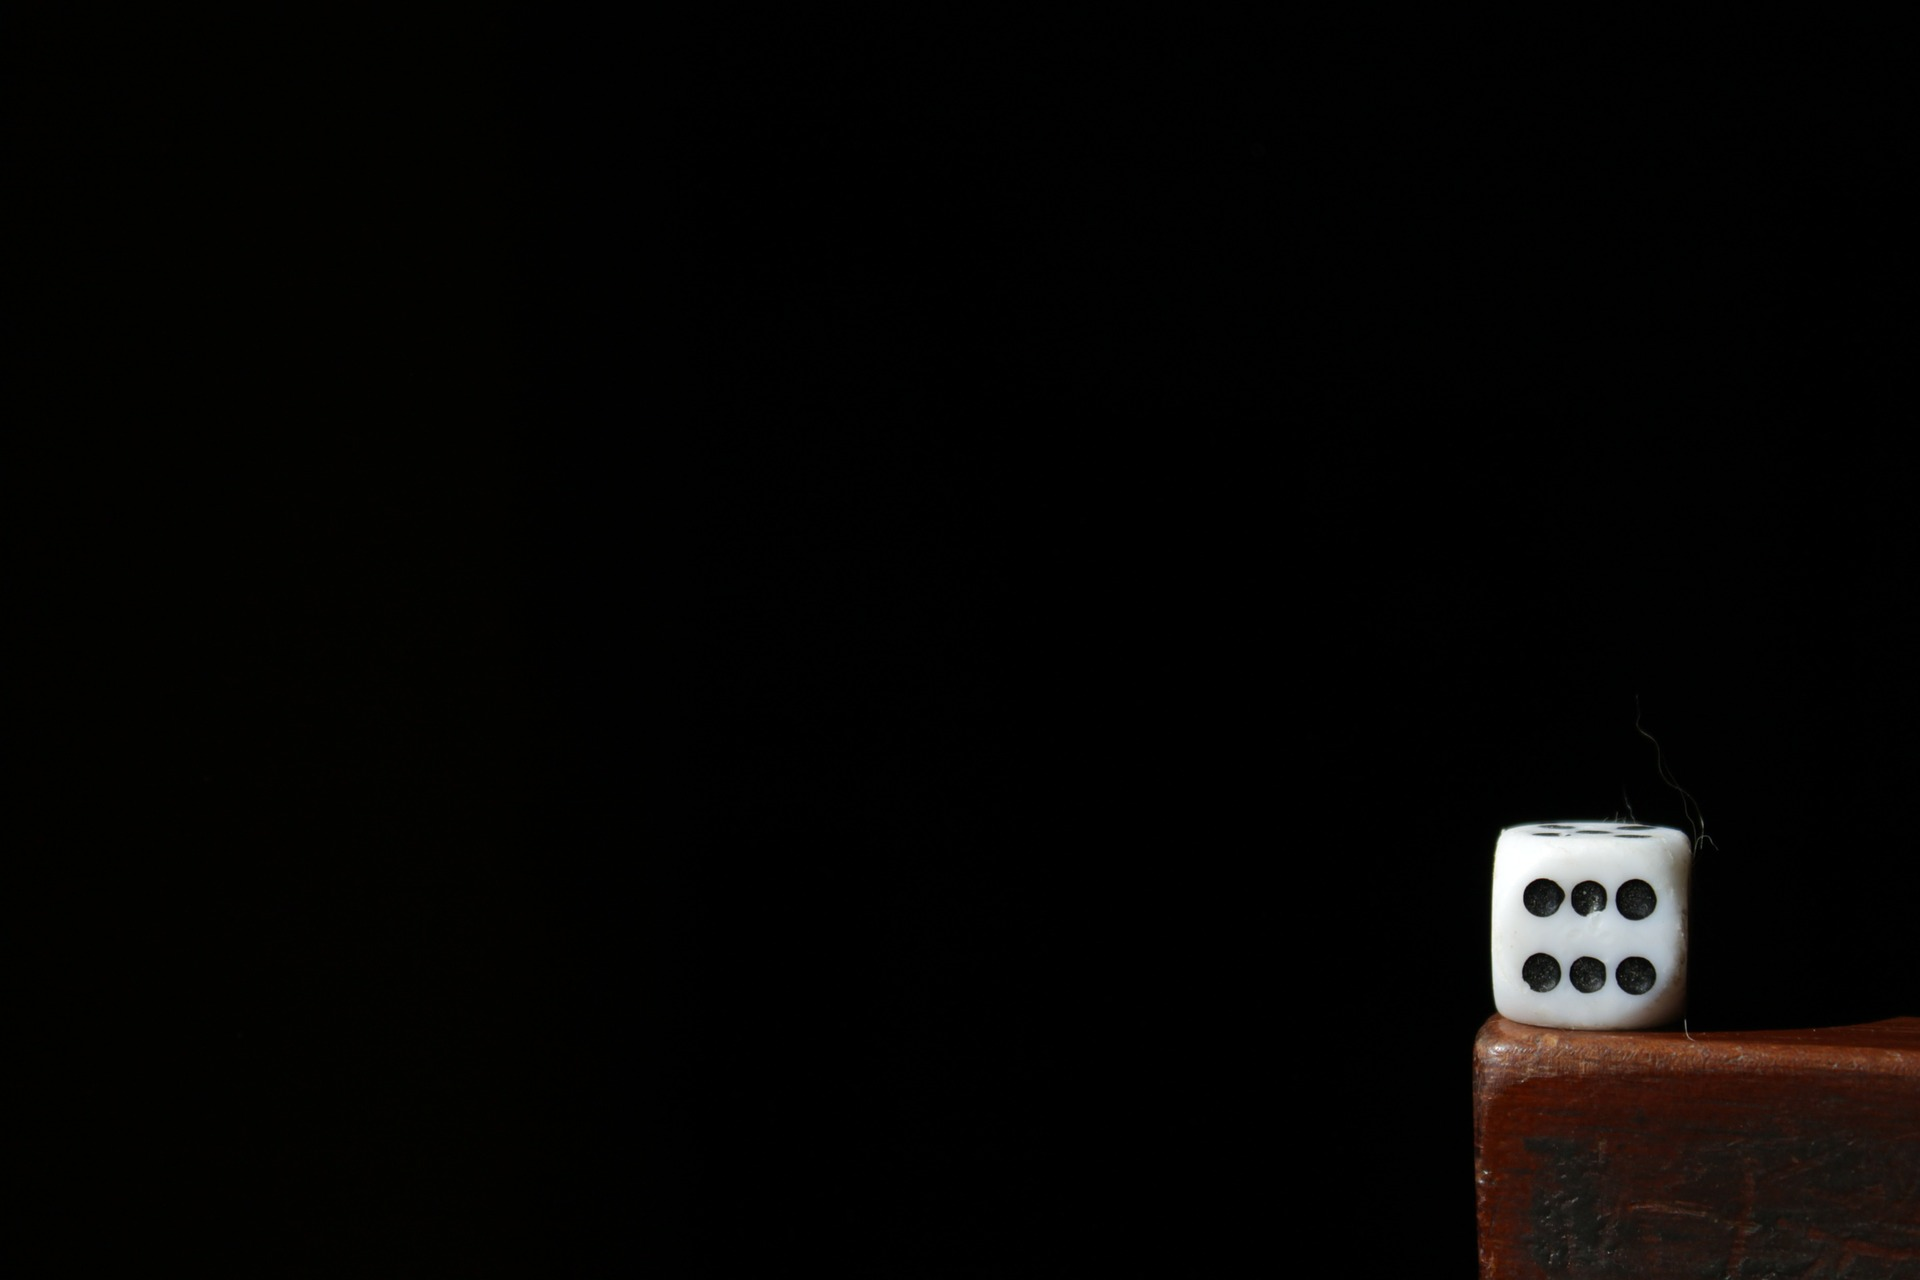 dice-game-56678_1920